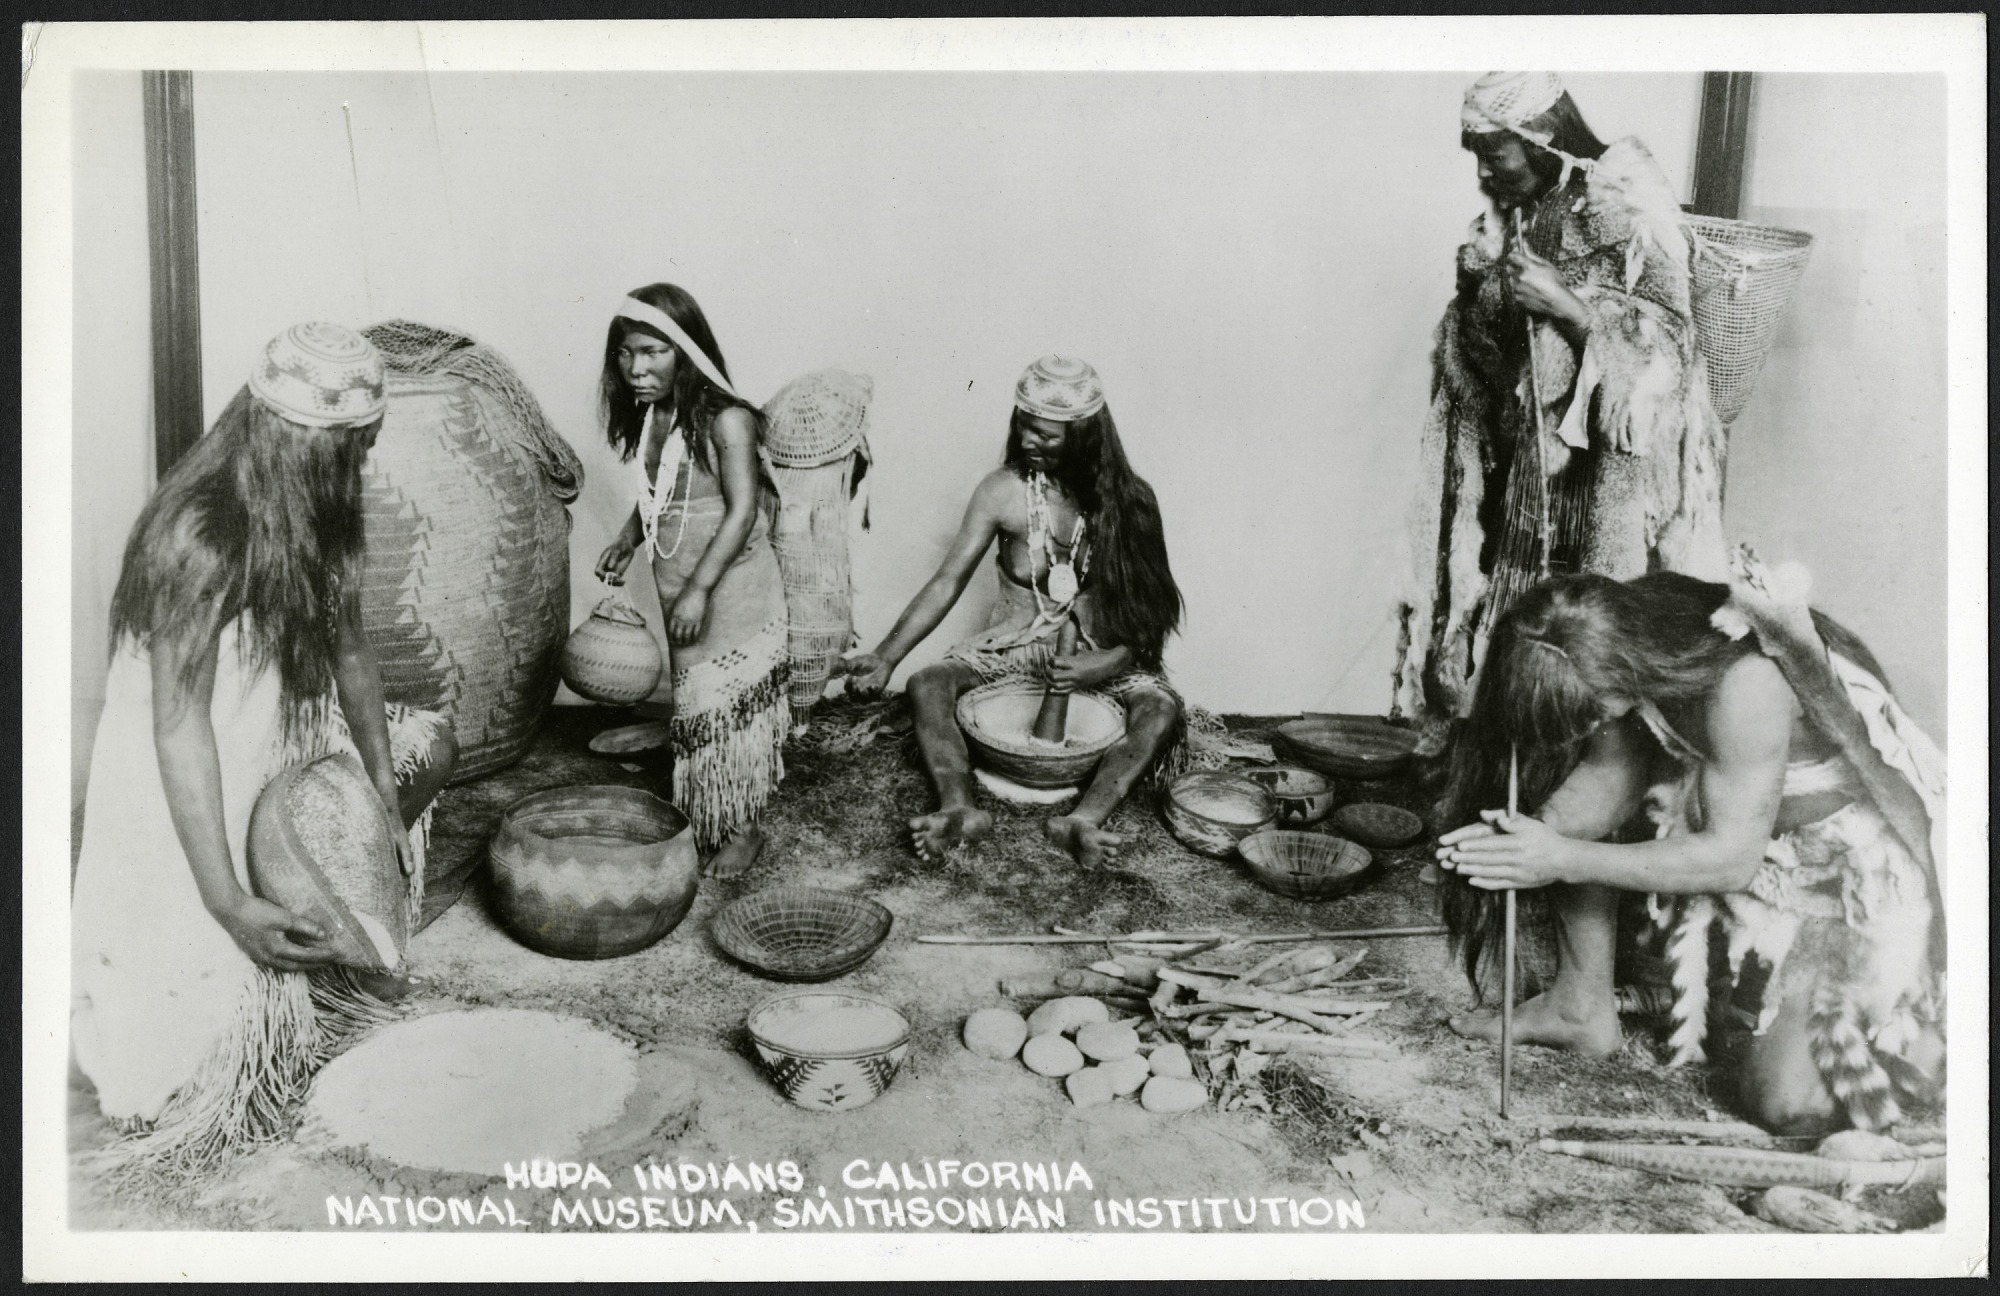 Postcard of Native American Hupa Indians Exhibit